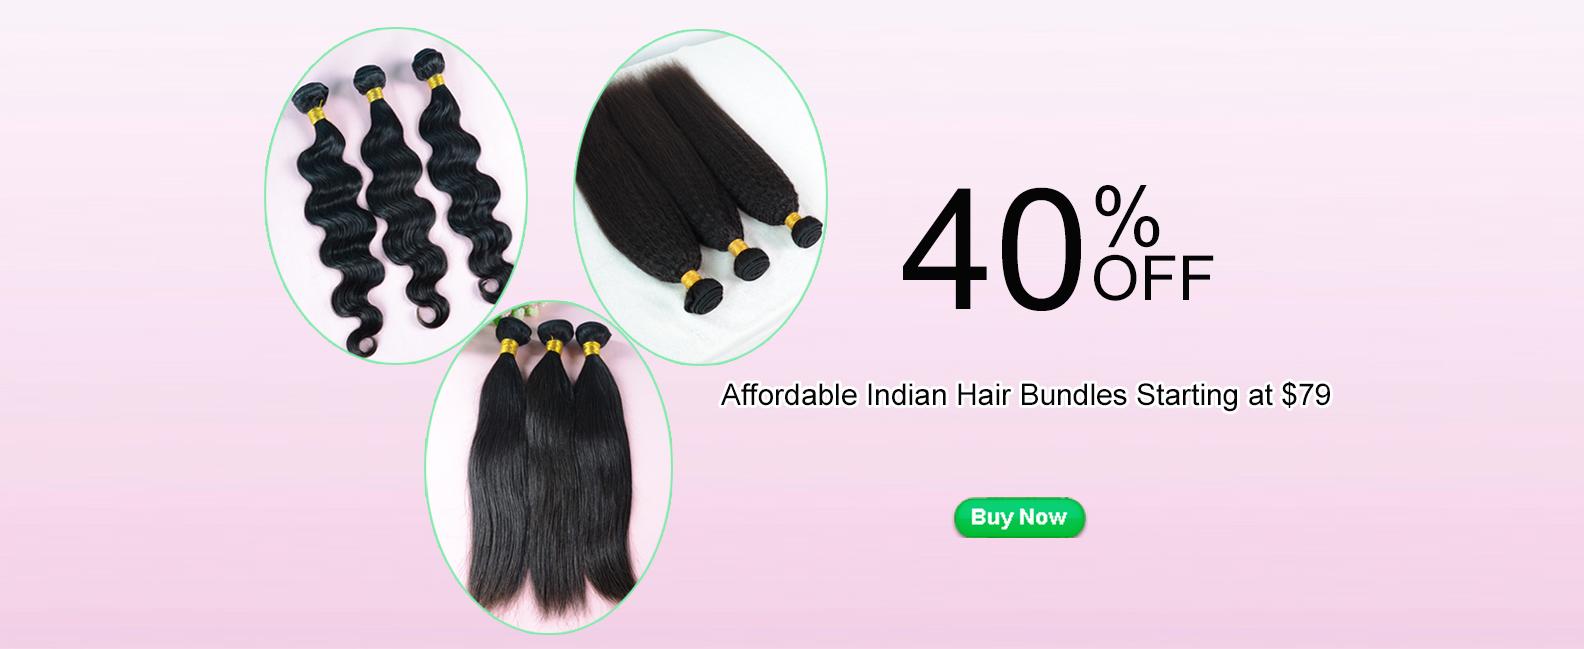 Indian hair bundles sale